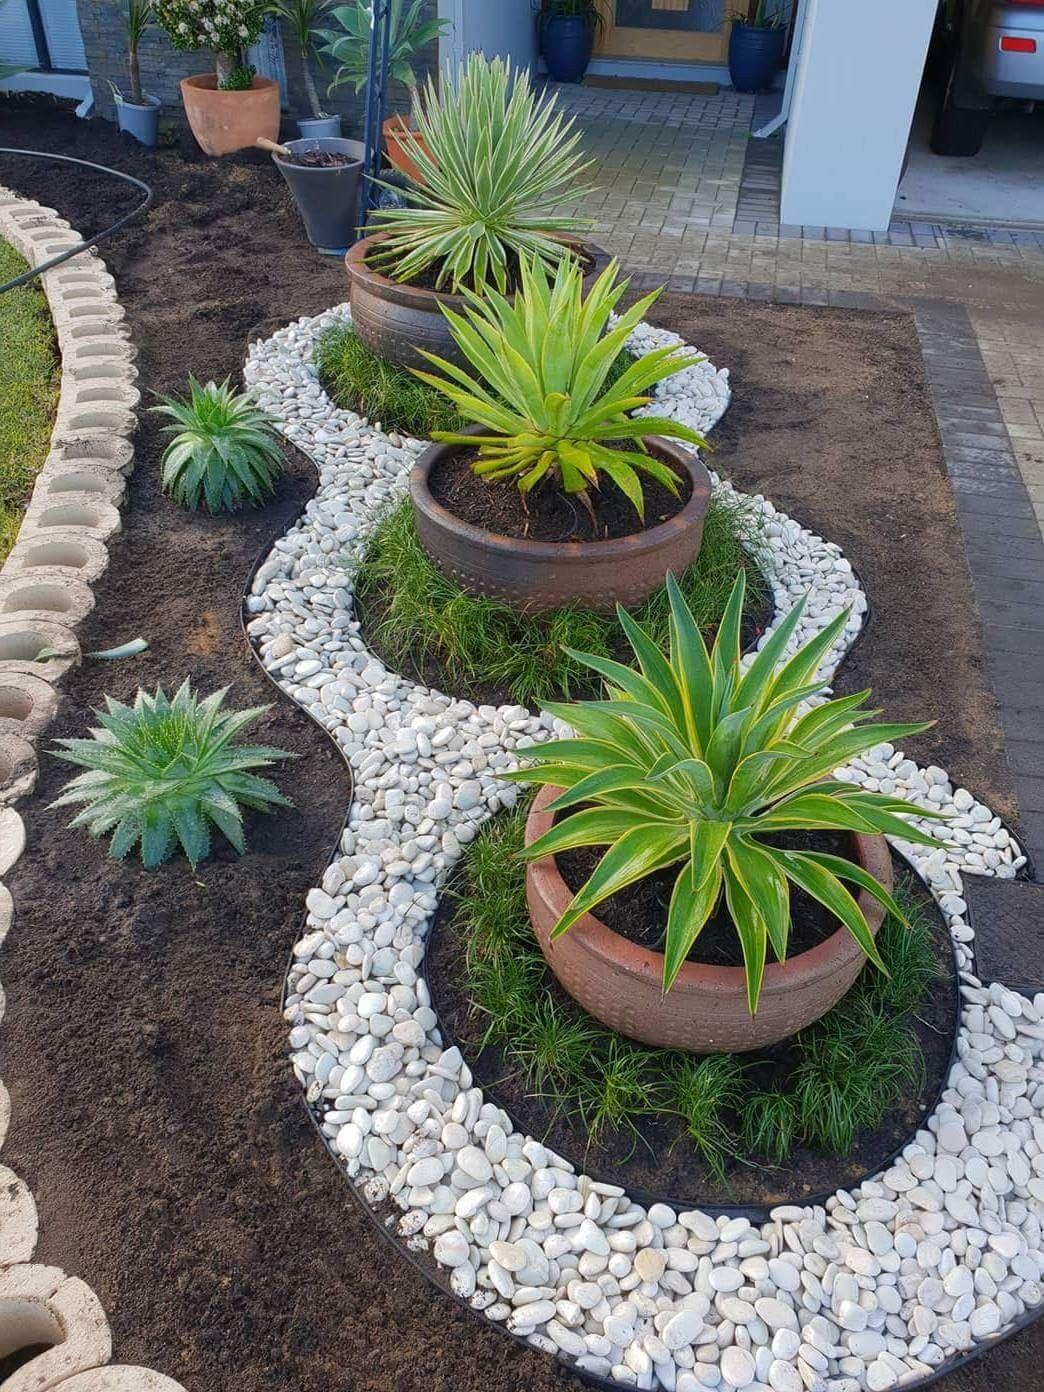 ae ac  dafae eb db    dt also best gardens images in backyard patio vegetable garden rh pinterest